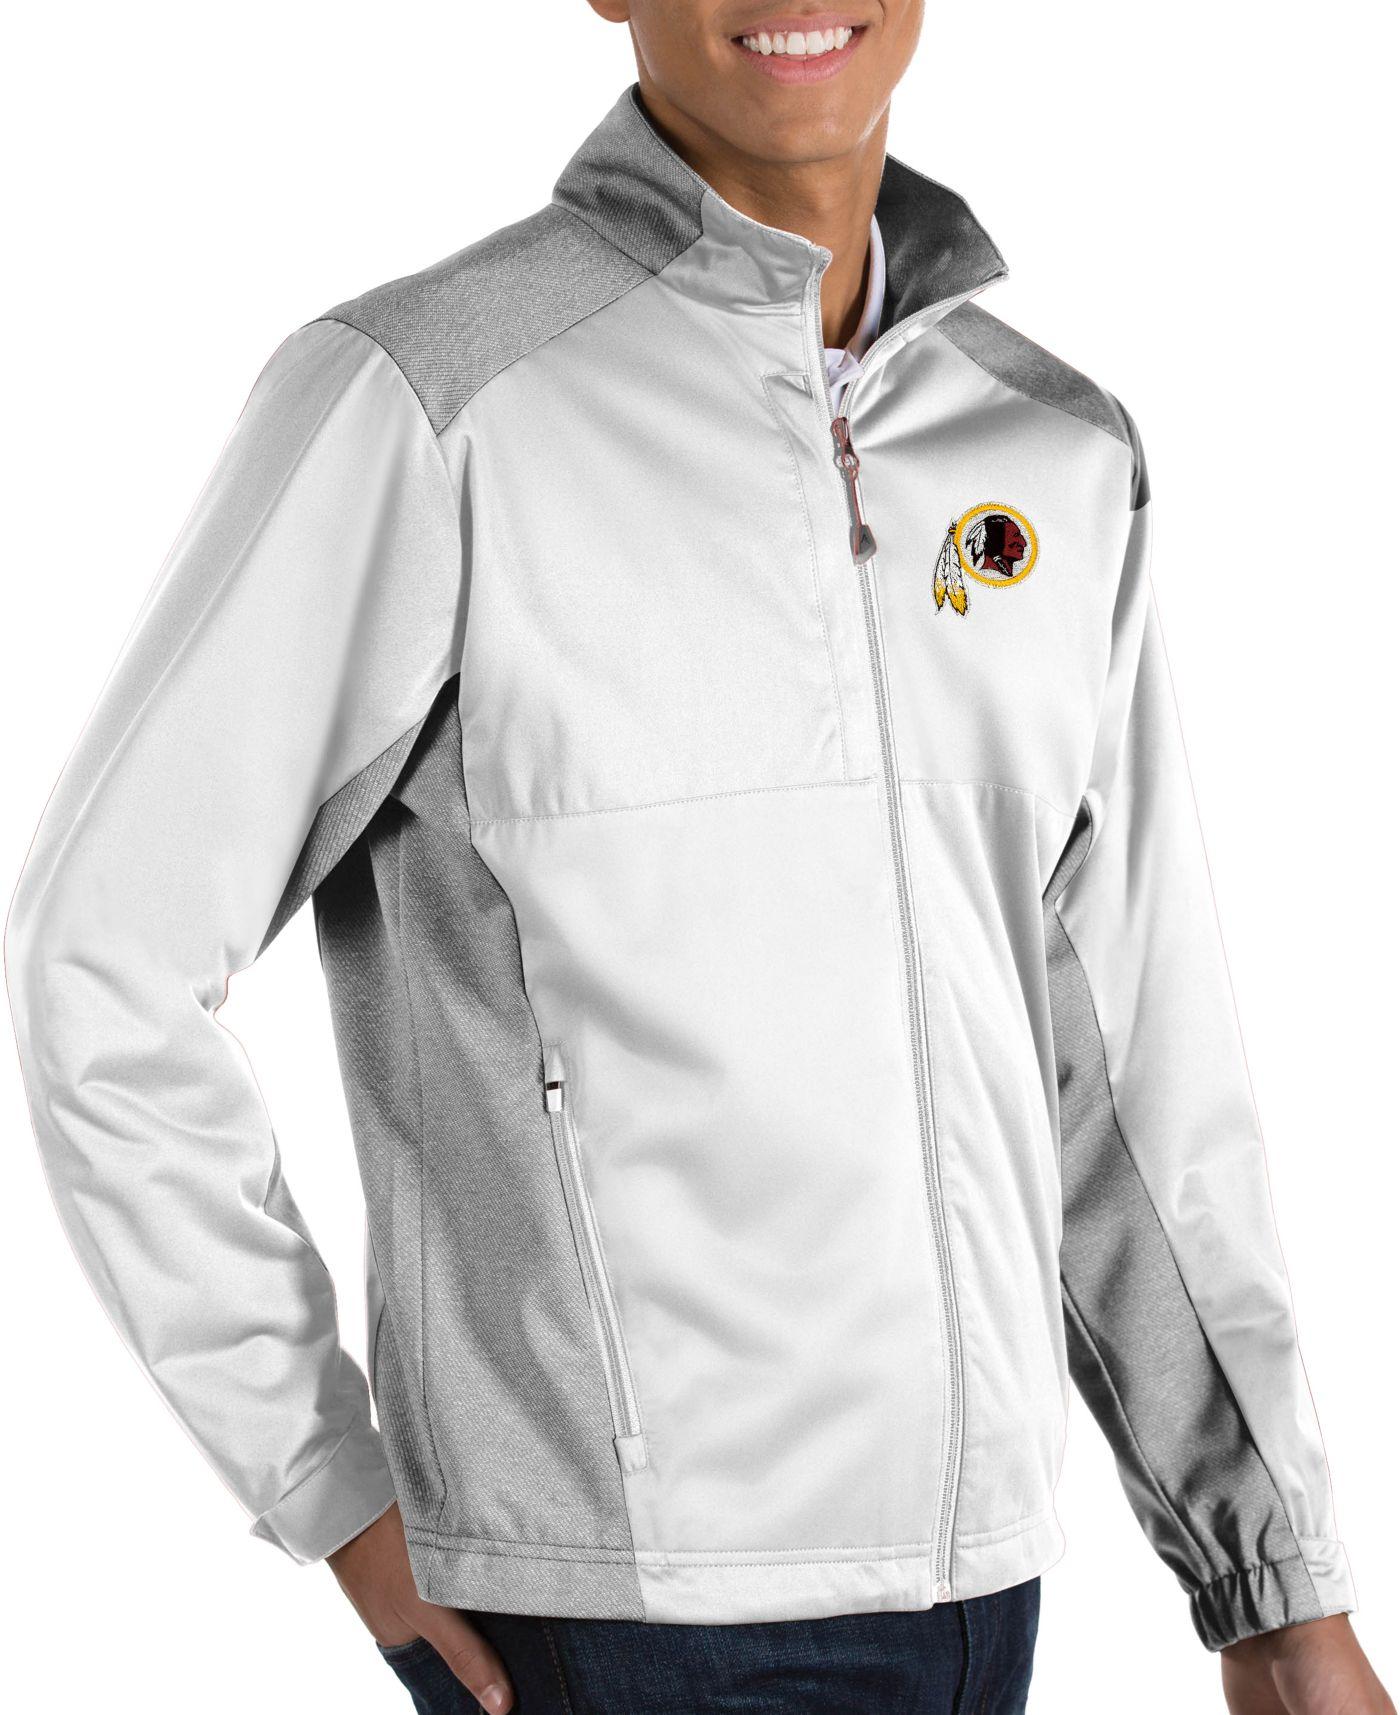 Antigua Men's Washington Redskins Revolve White Full-Zip Jacket